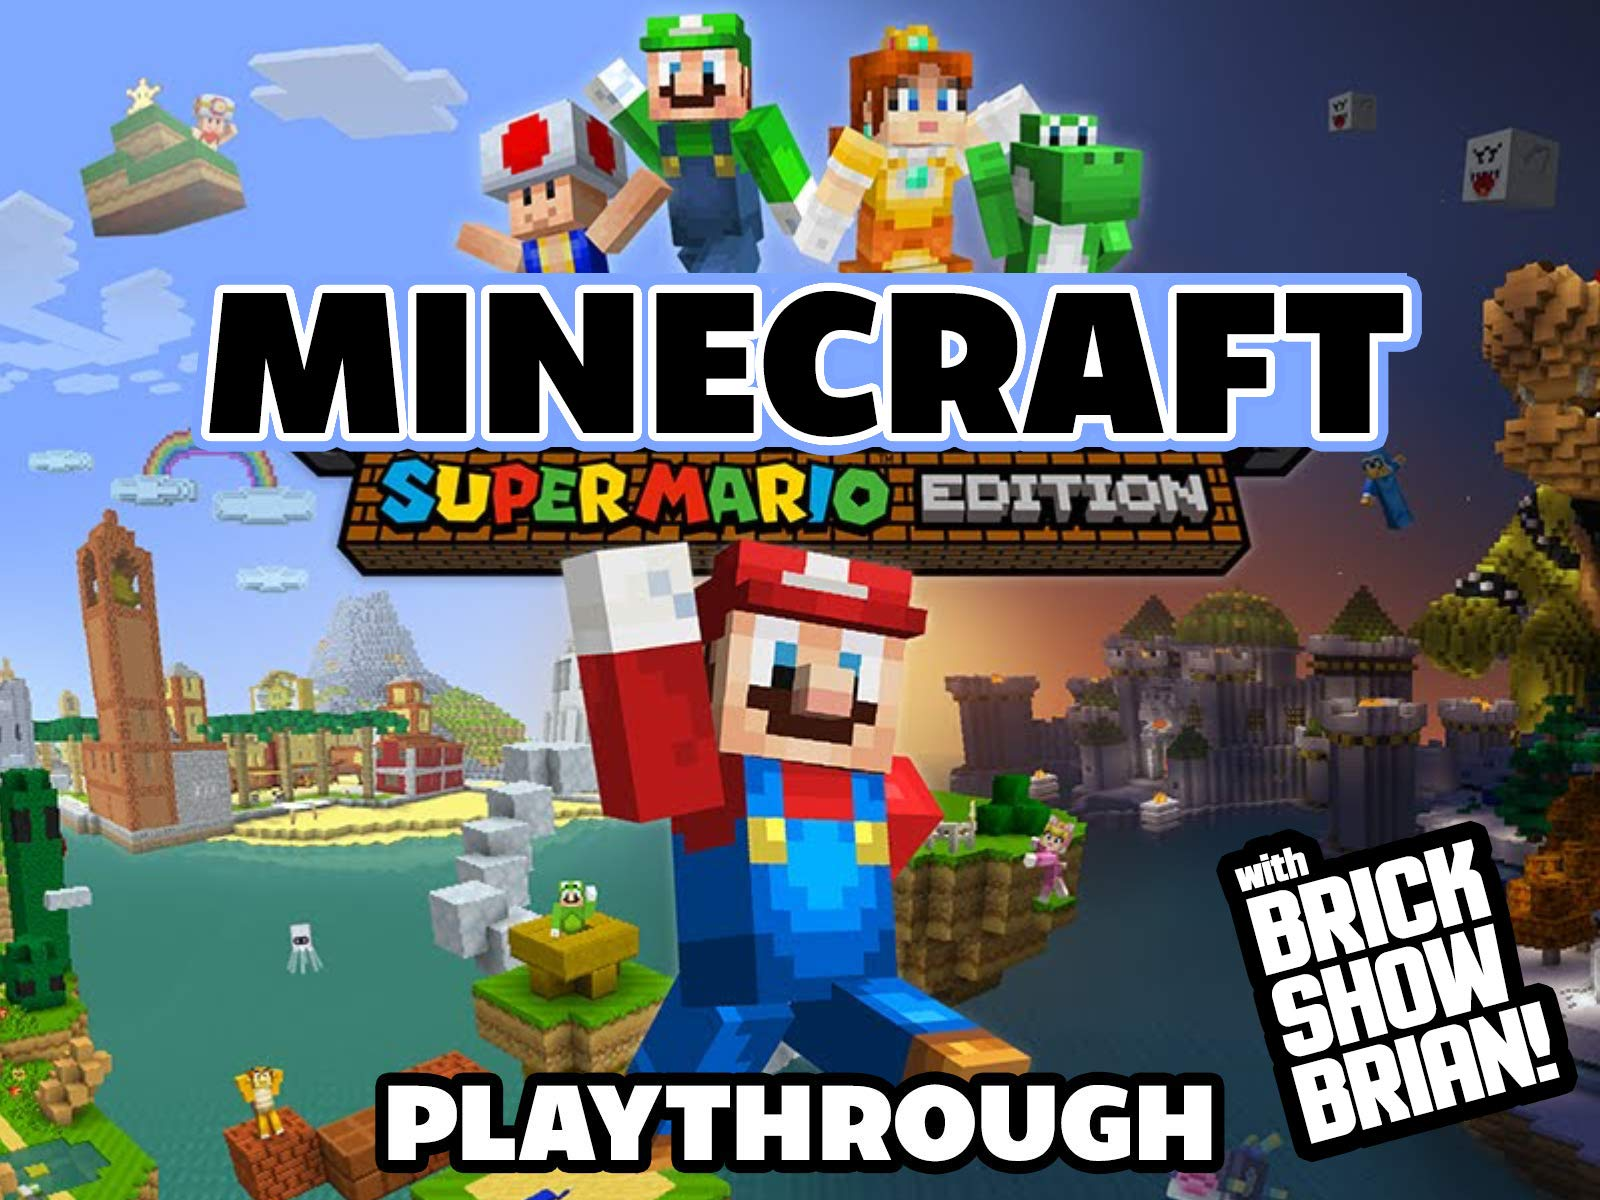 Watch Clip: Minecraft Super Mario Edition Playthrough with Brick